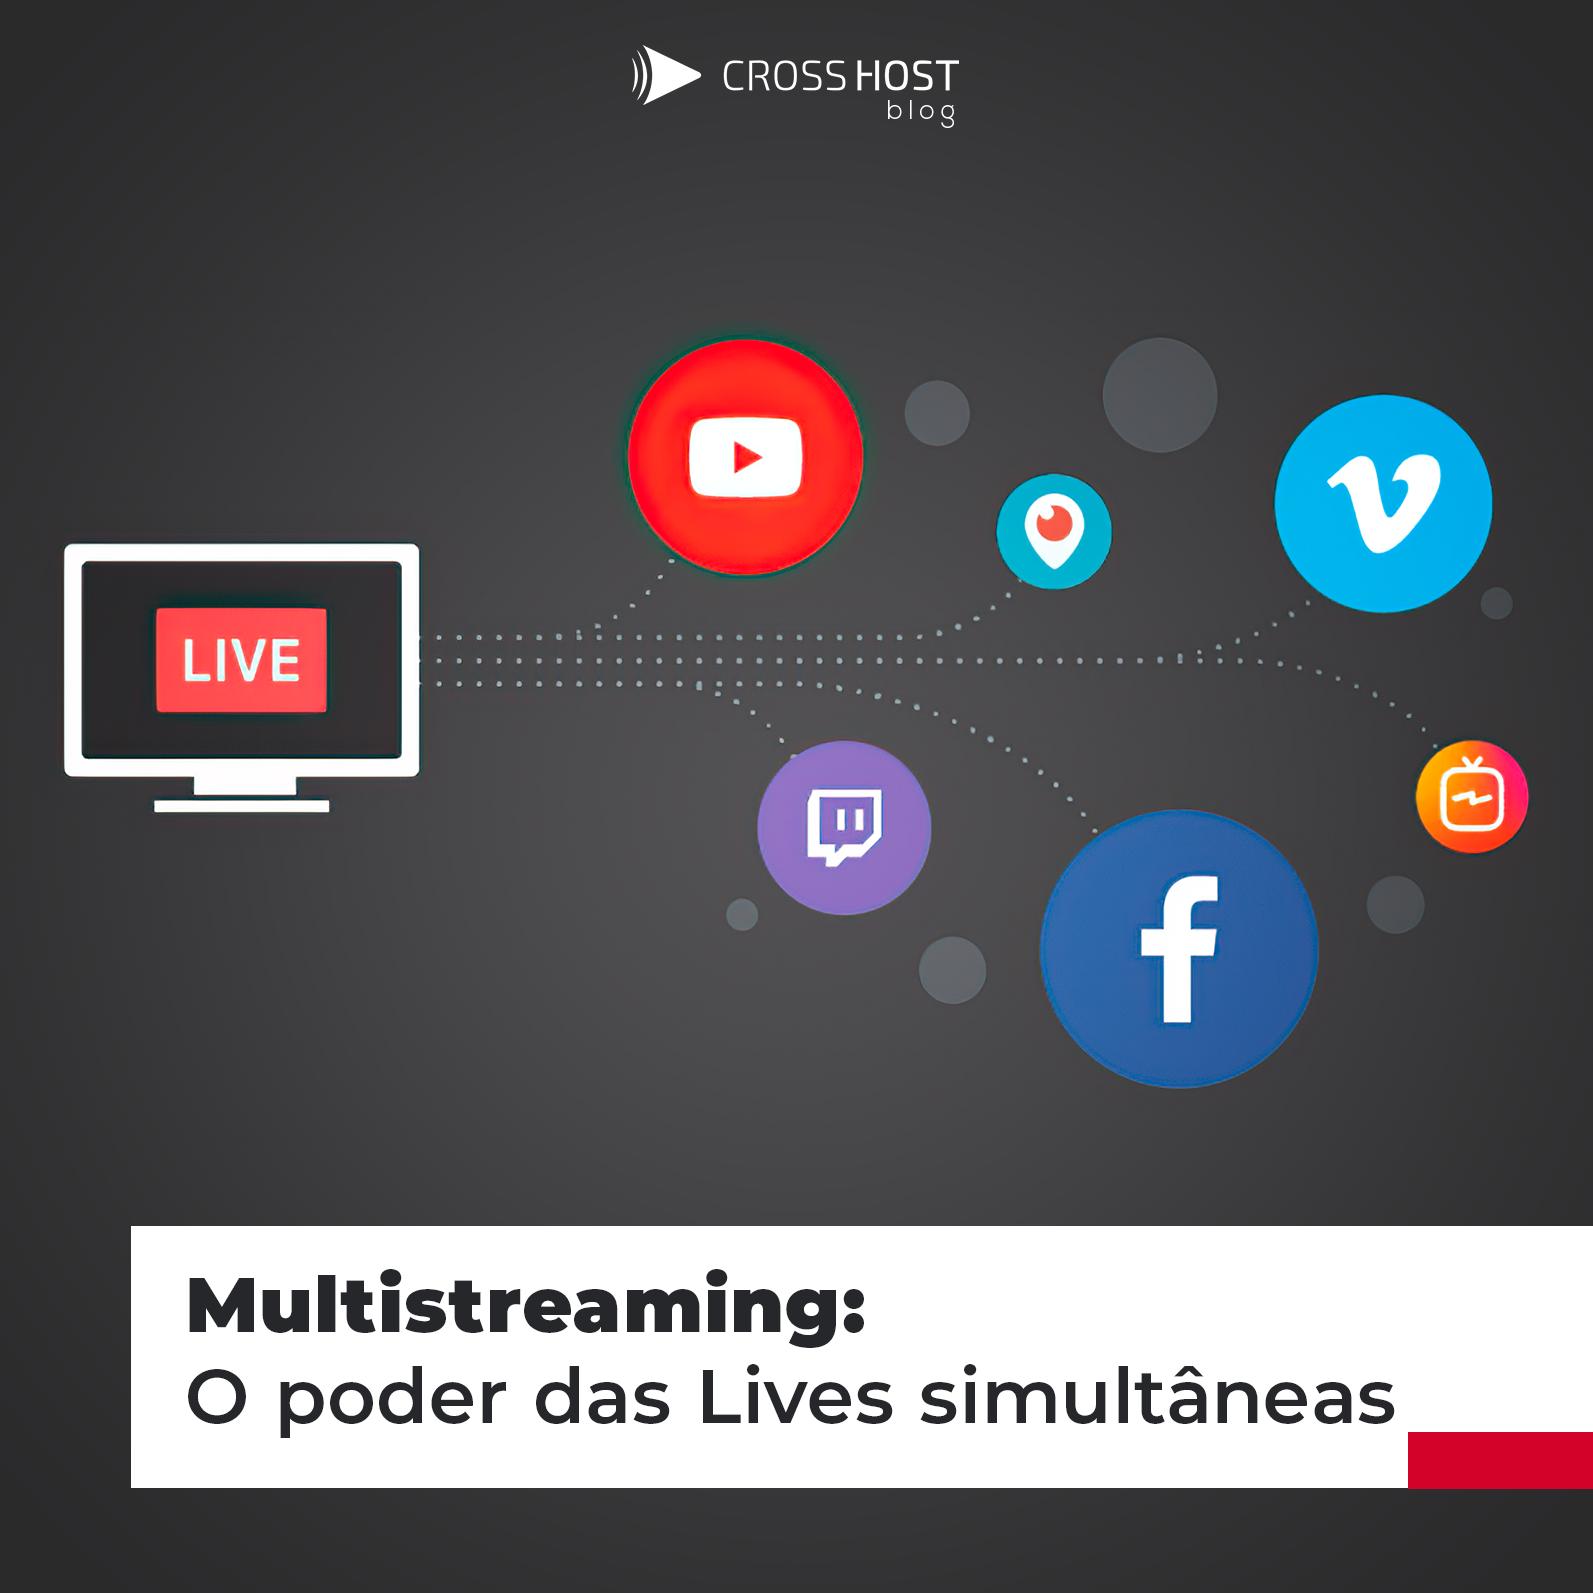 Multistreaming : O poder das Lives simultâneas